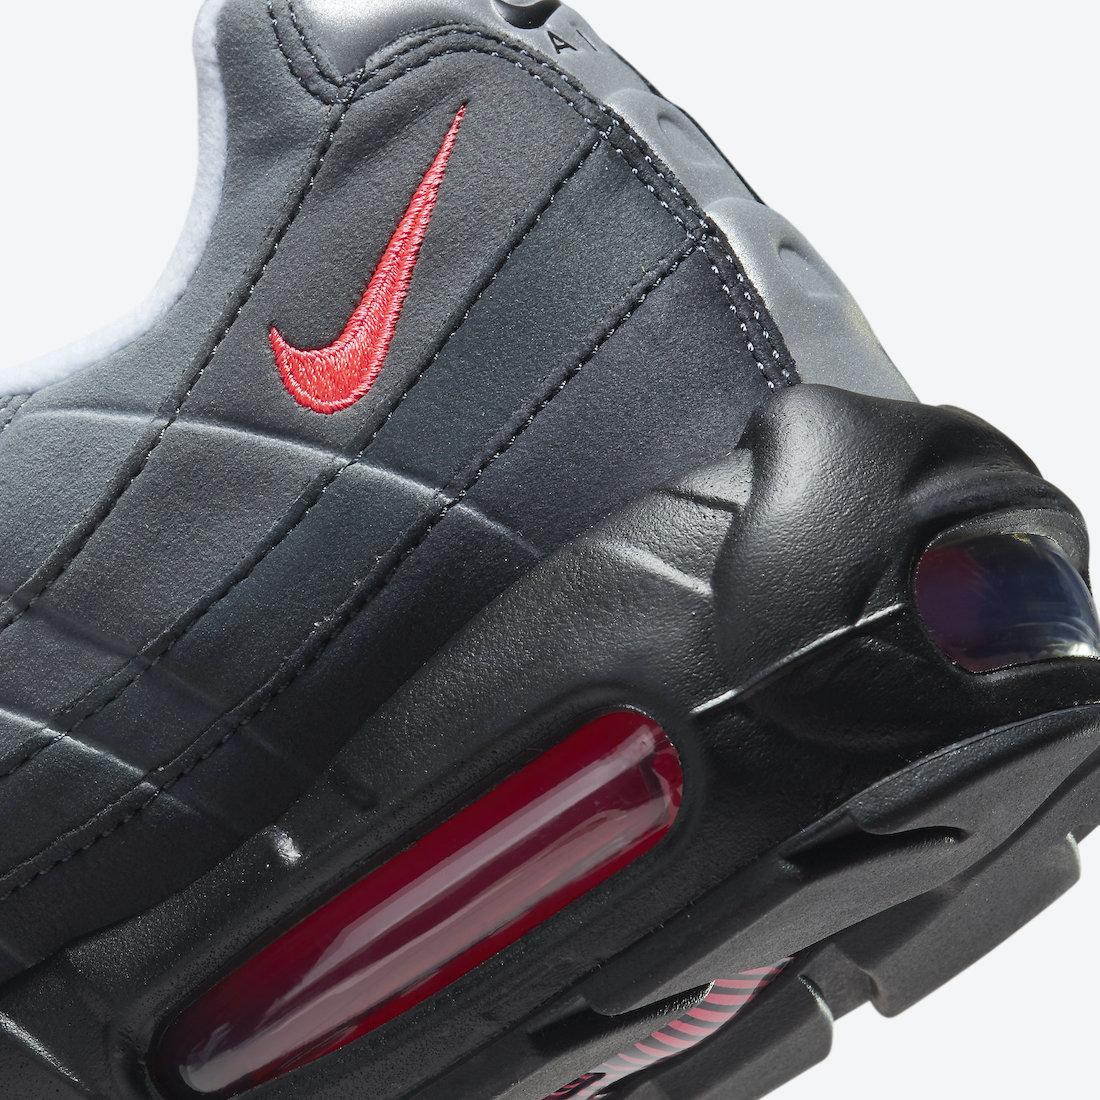 Nike Air Max 95 Greedy 3.0 DN8020-001 Release Date